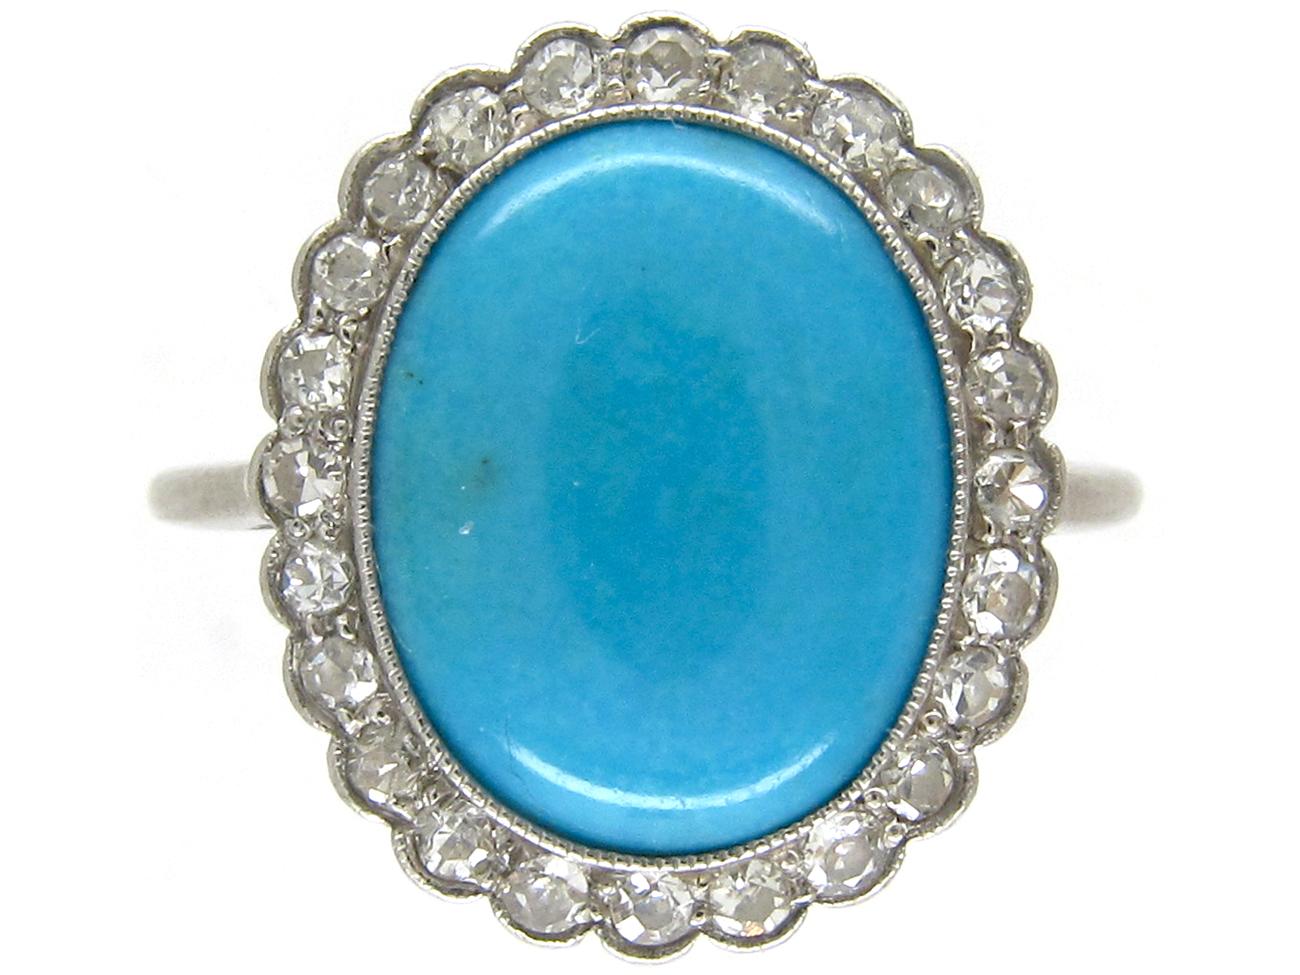 Edwardian Turquoise & Diamond Cluster Ring